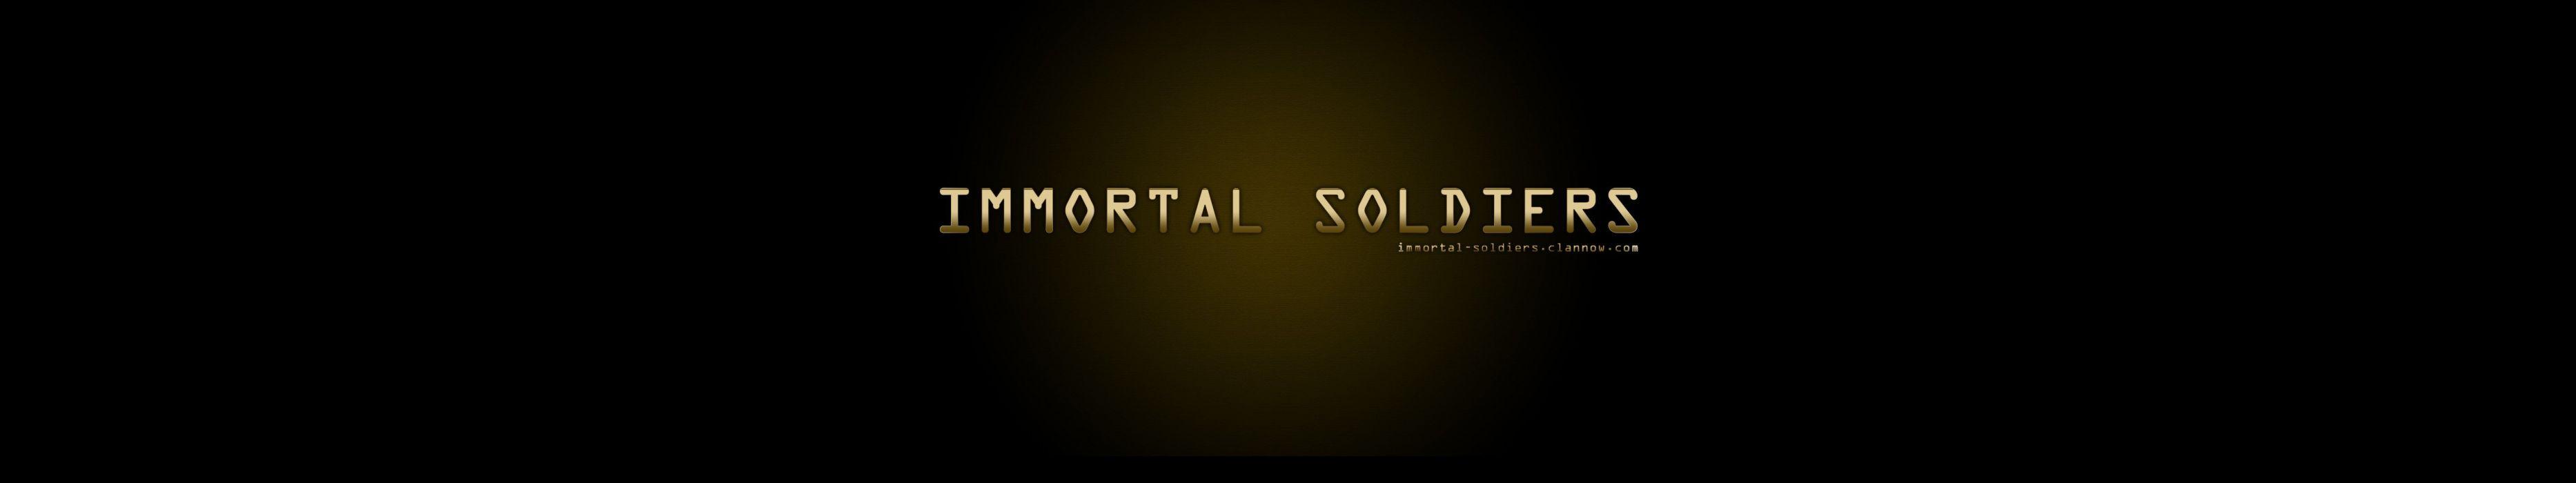 soldiers immortal multiscreen wallpaper